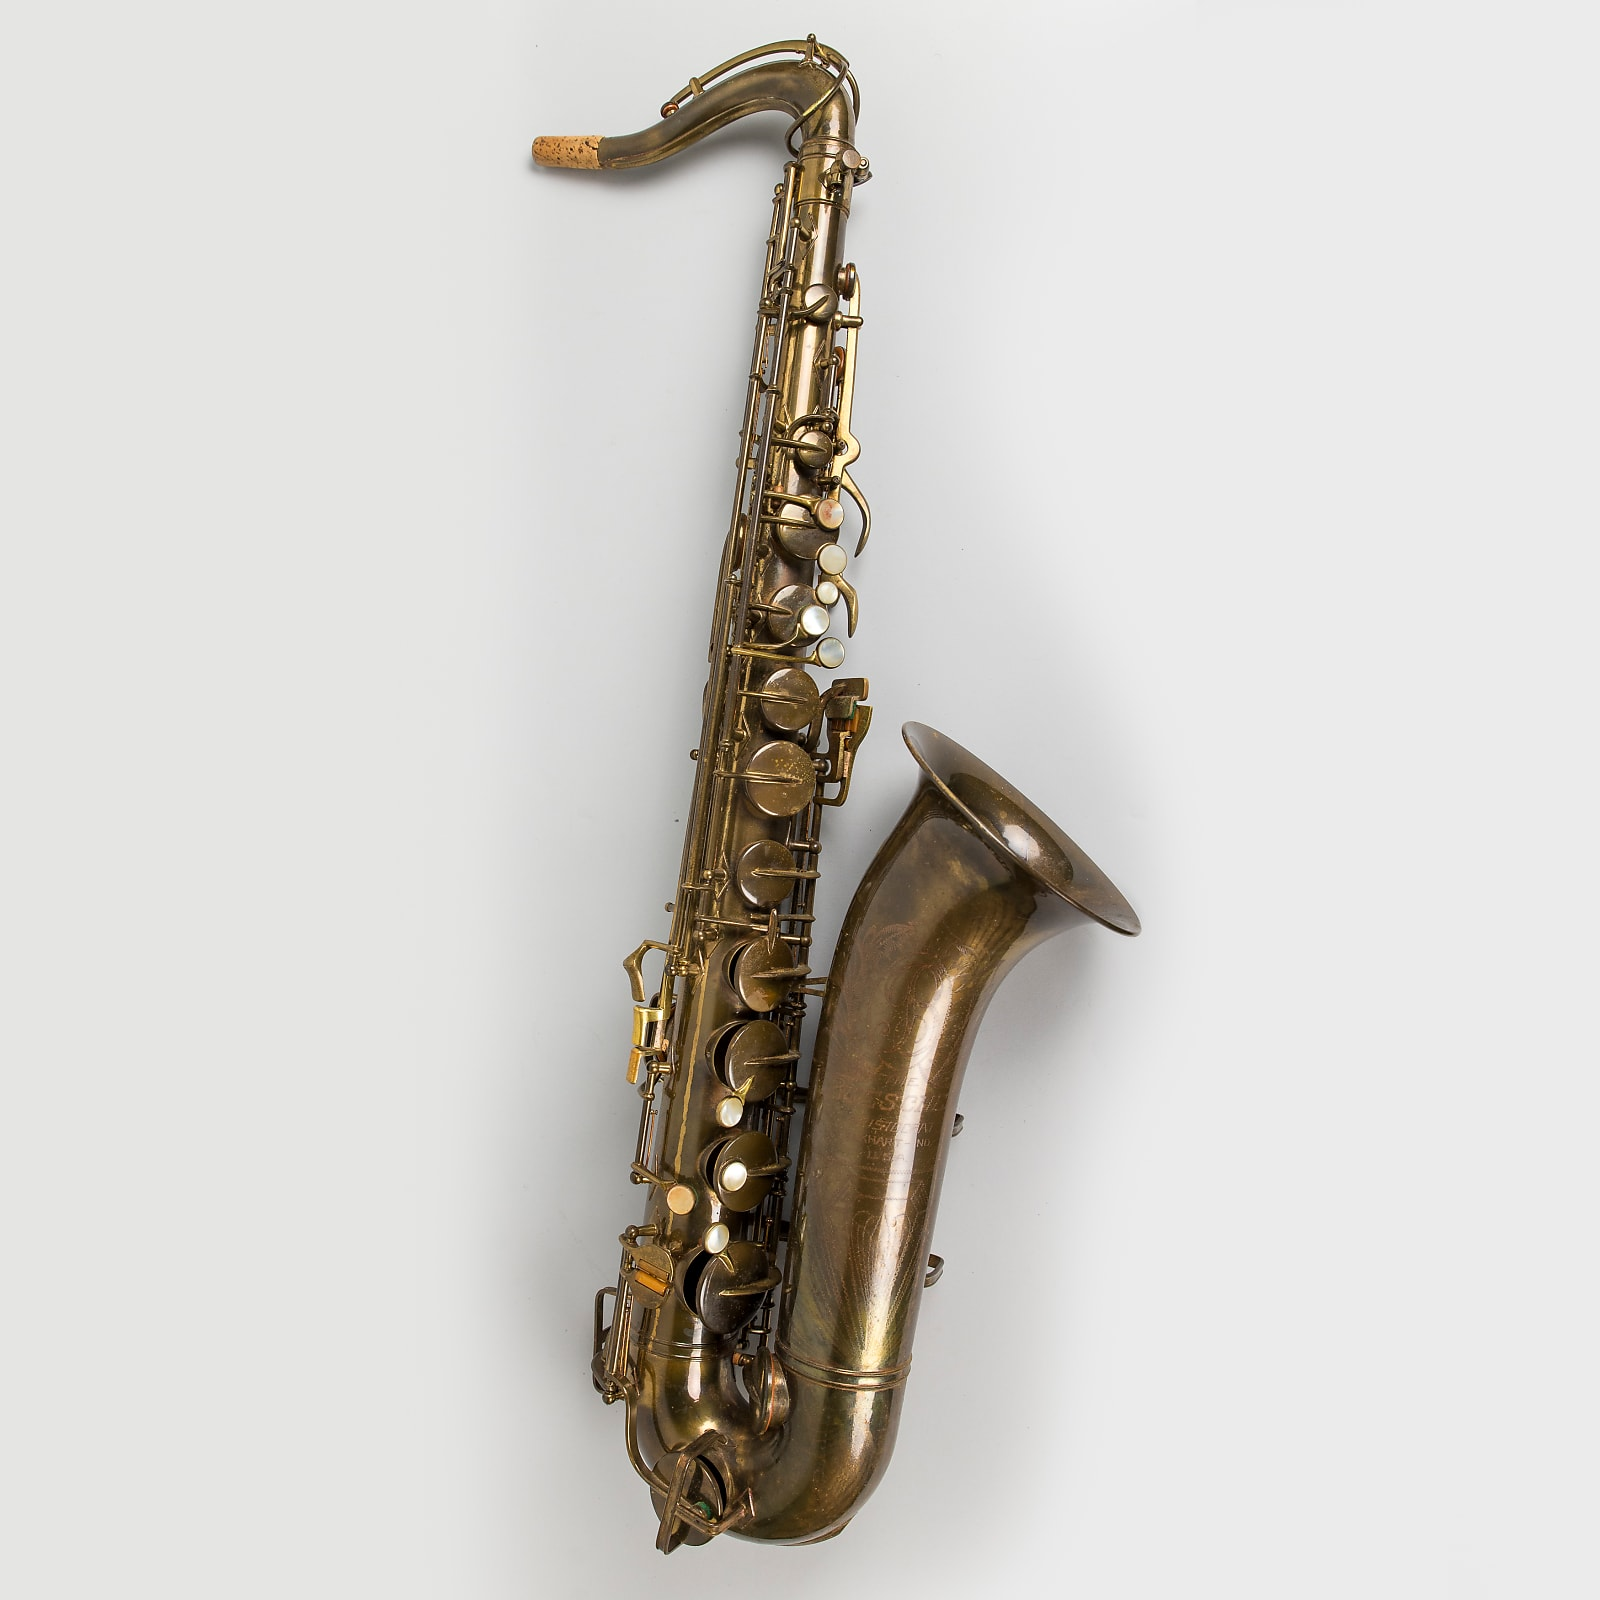 Vintage ~1948 Buescher Big B Tenor Saxophone